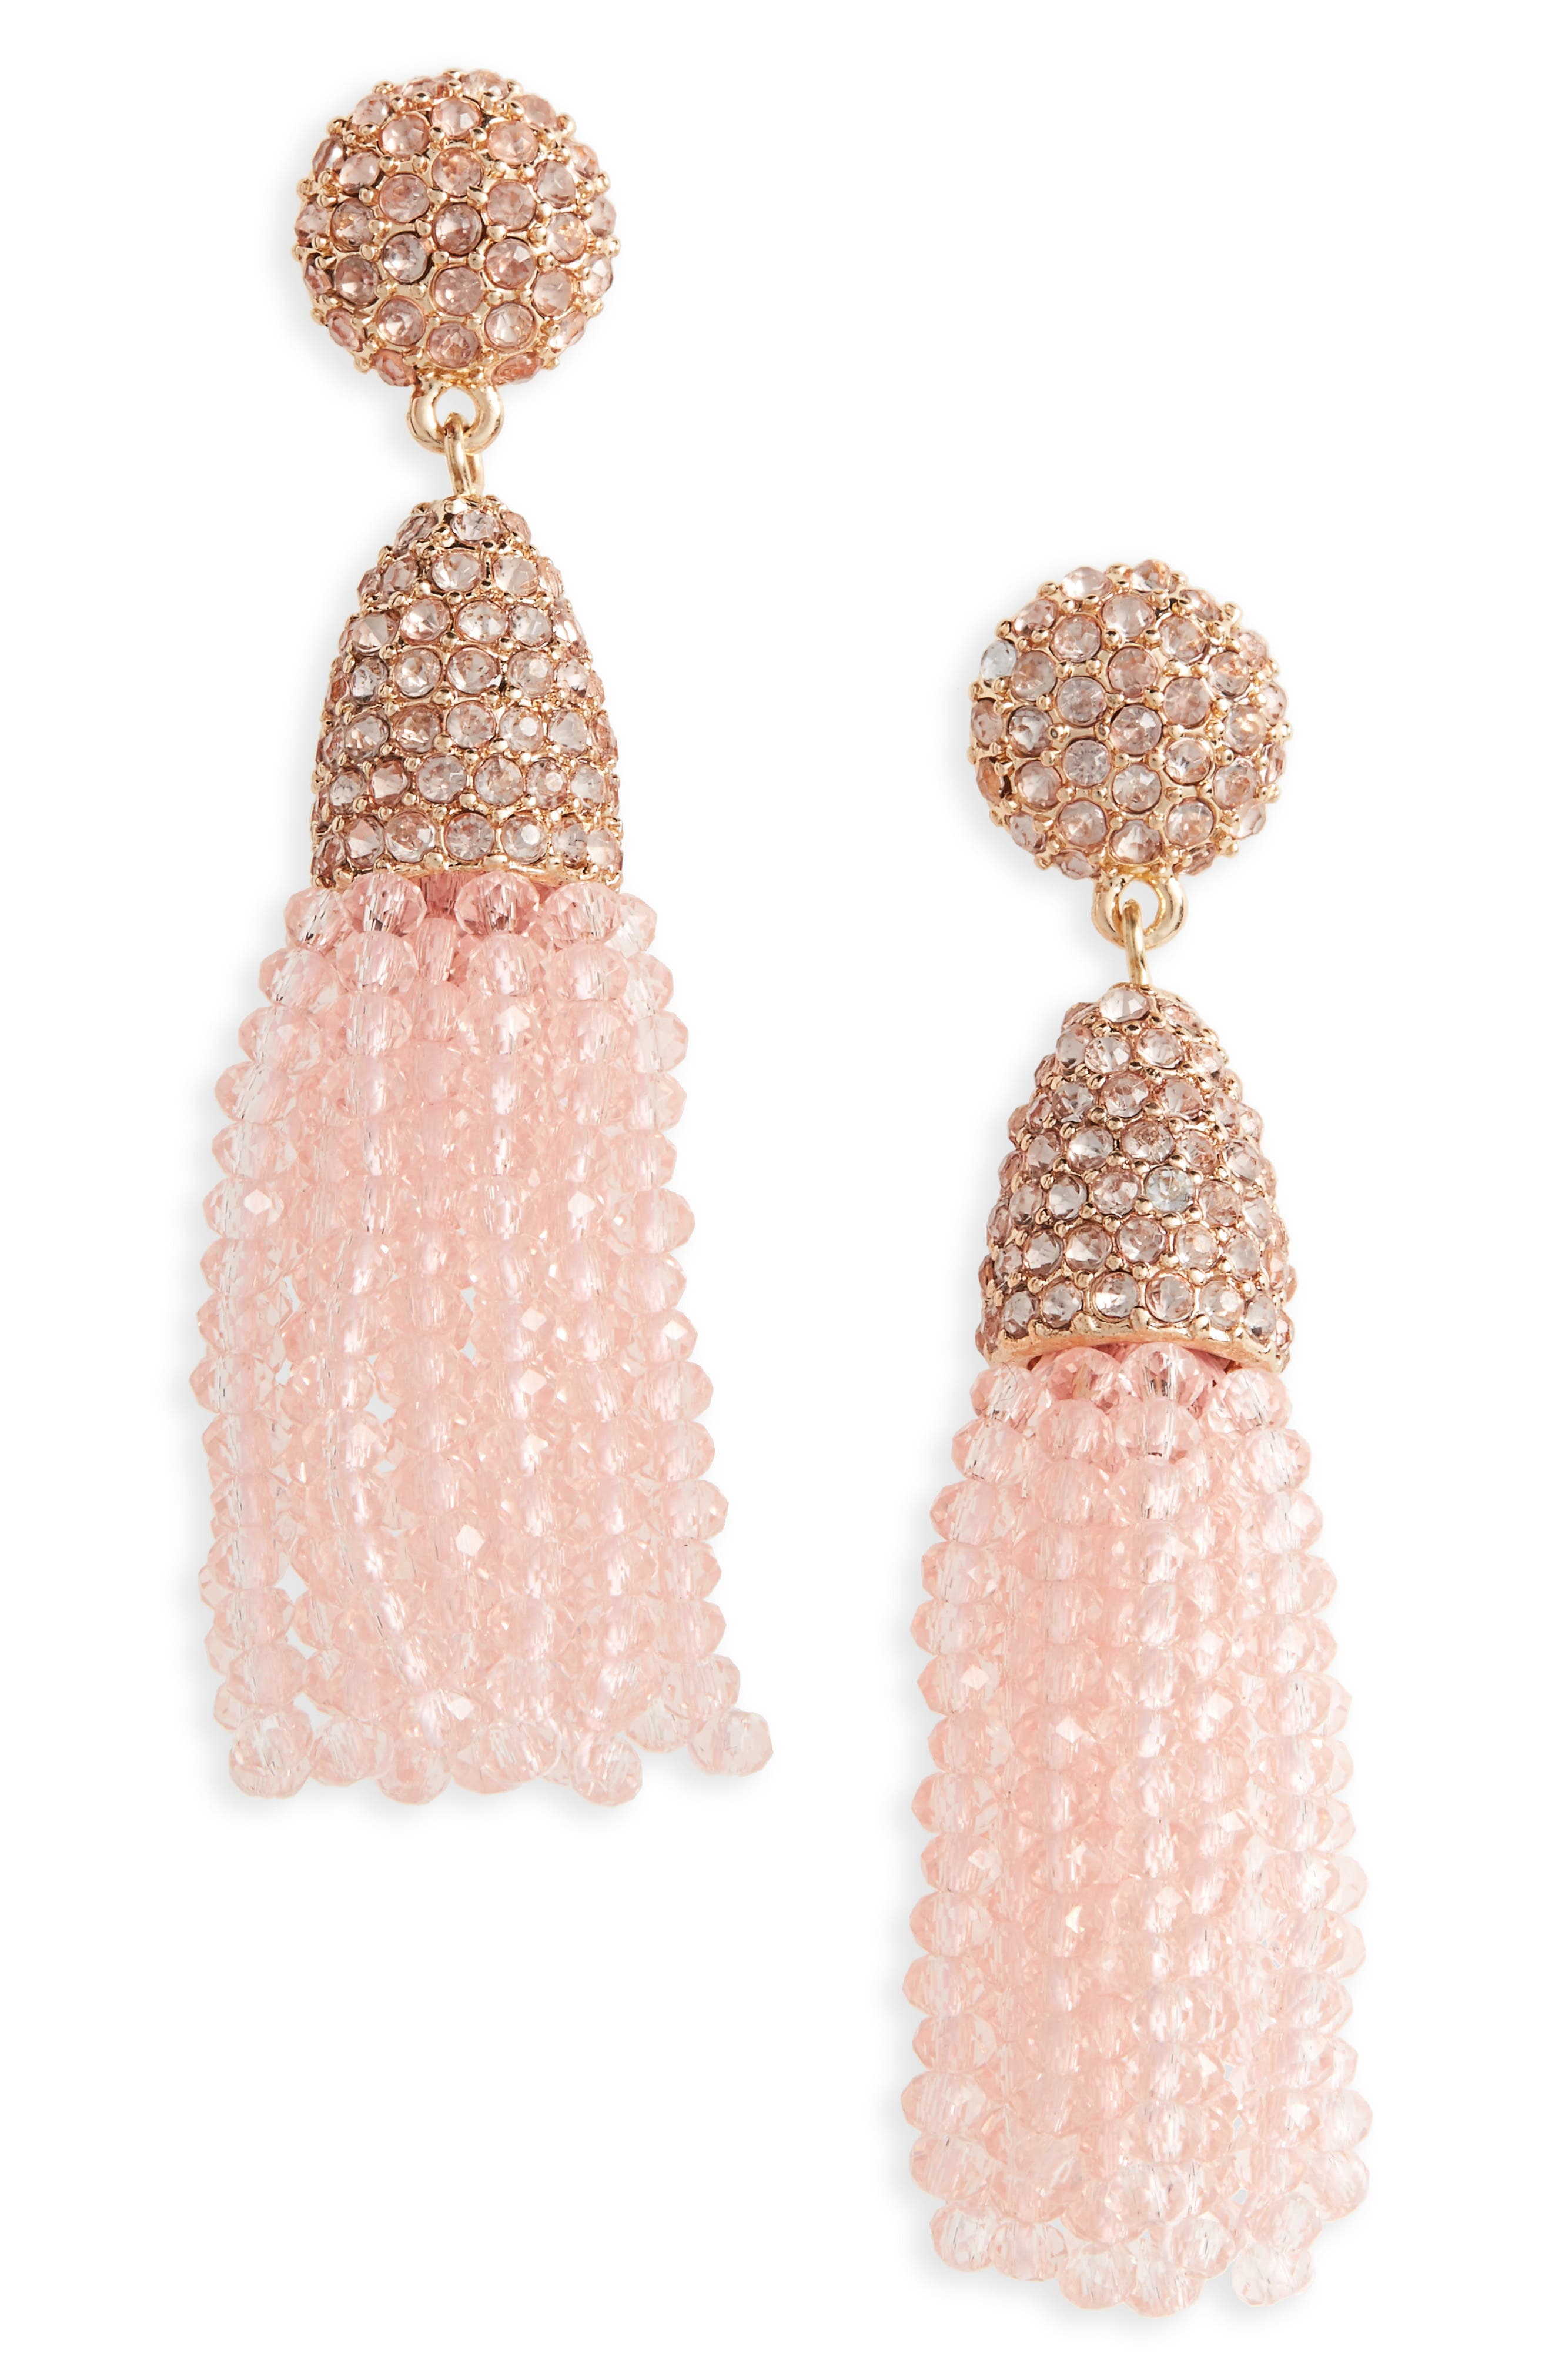 Annabelle Mini Tassel Drop Earrings,                             Main thumbnail 1, color,                             Light Pink